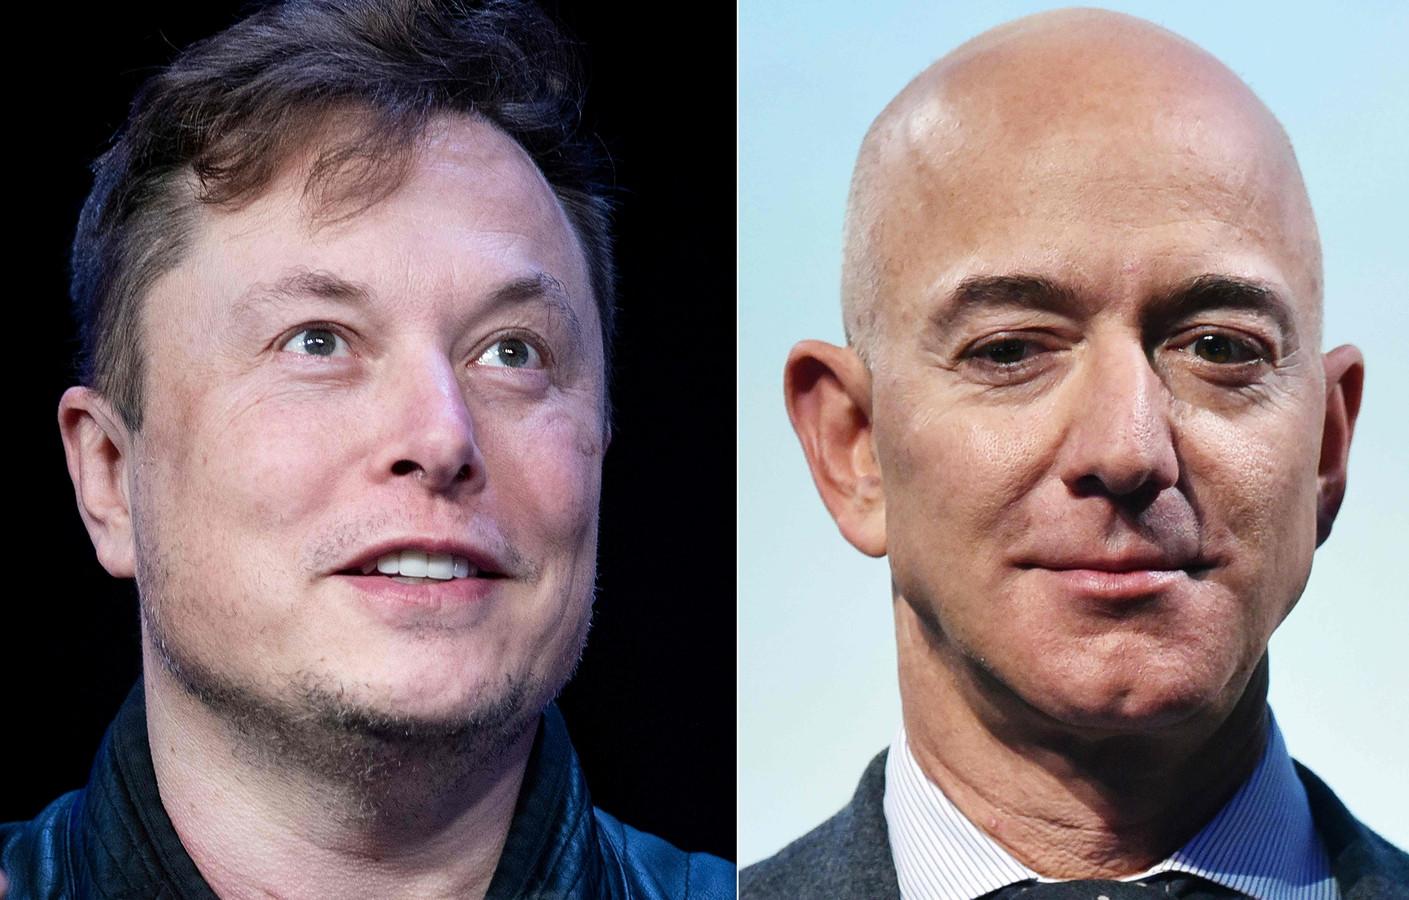 Elon Musk (Tesla, SpaceX) et Jeff Bezos (Amazon)